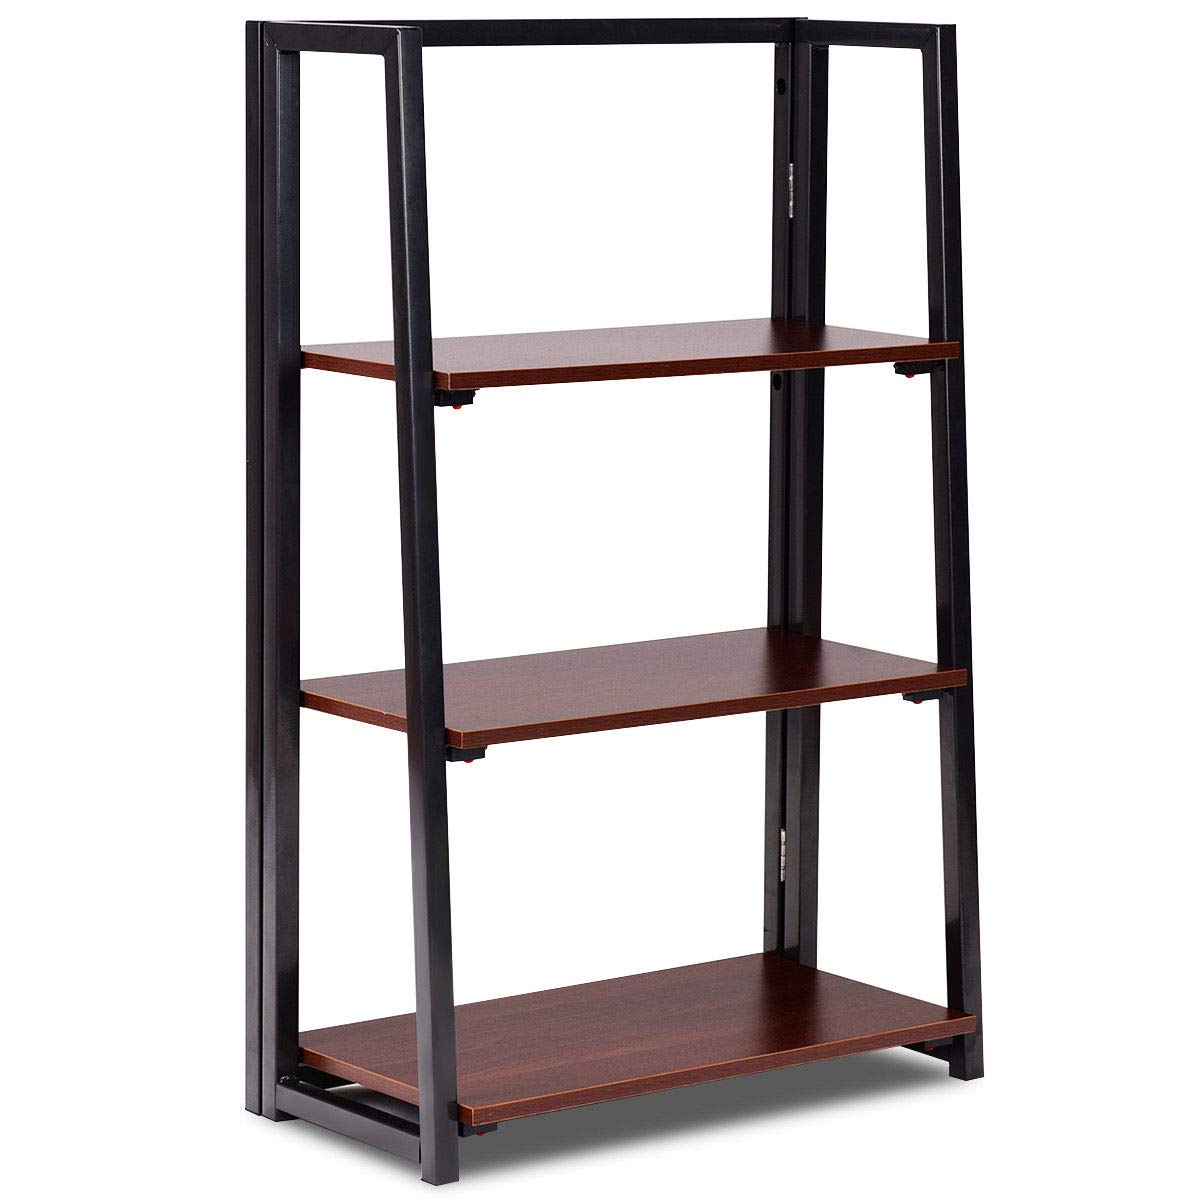 Amazon.com: Caraya - Estantería plegable con 3 estantes ...